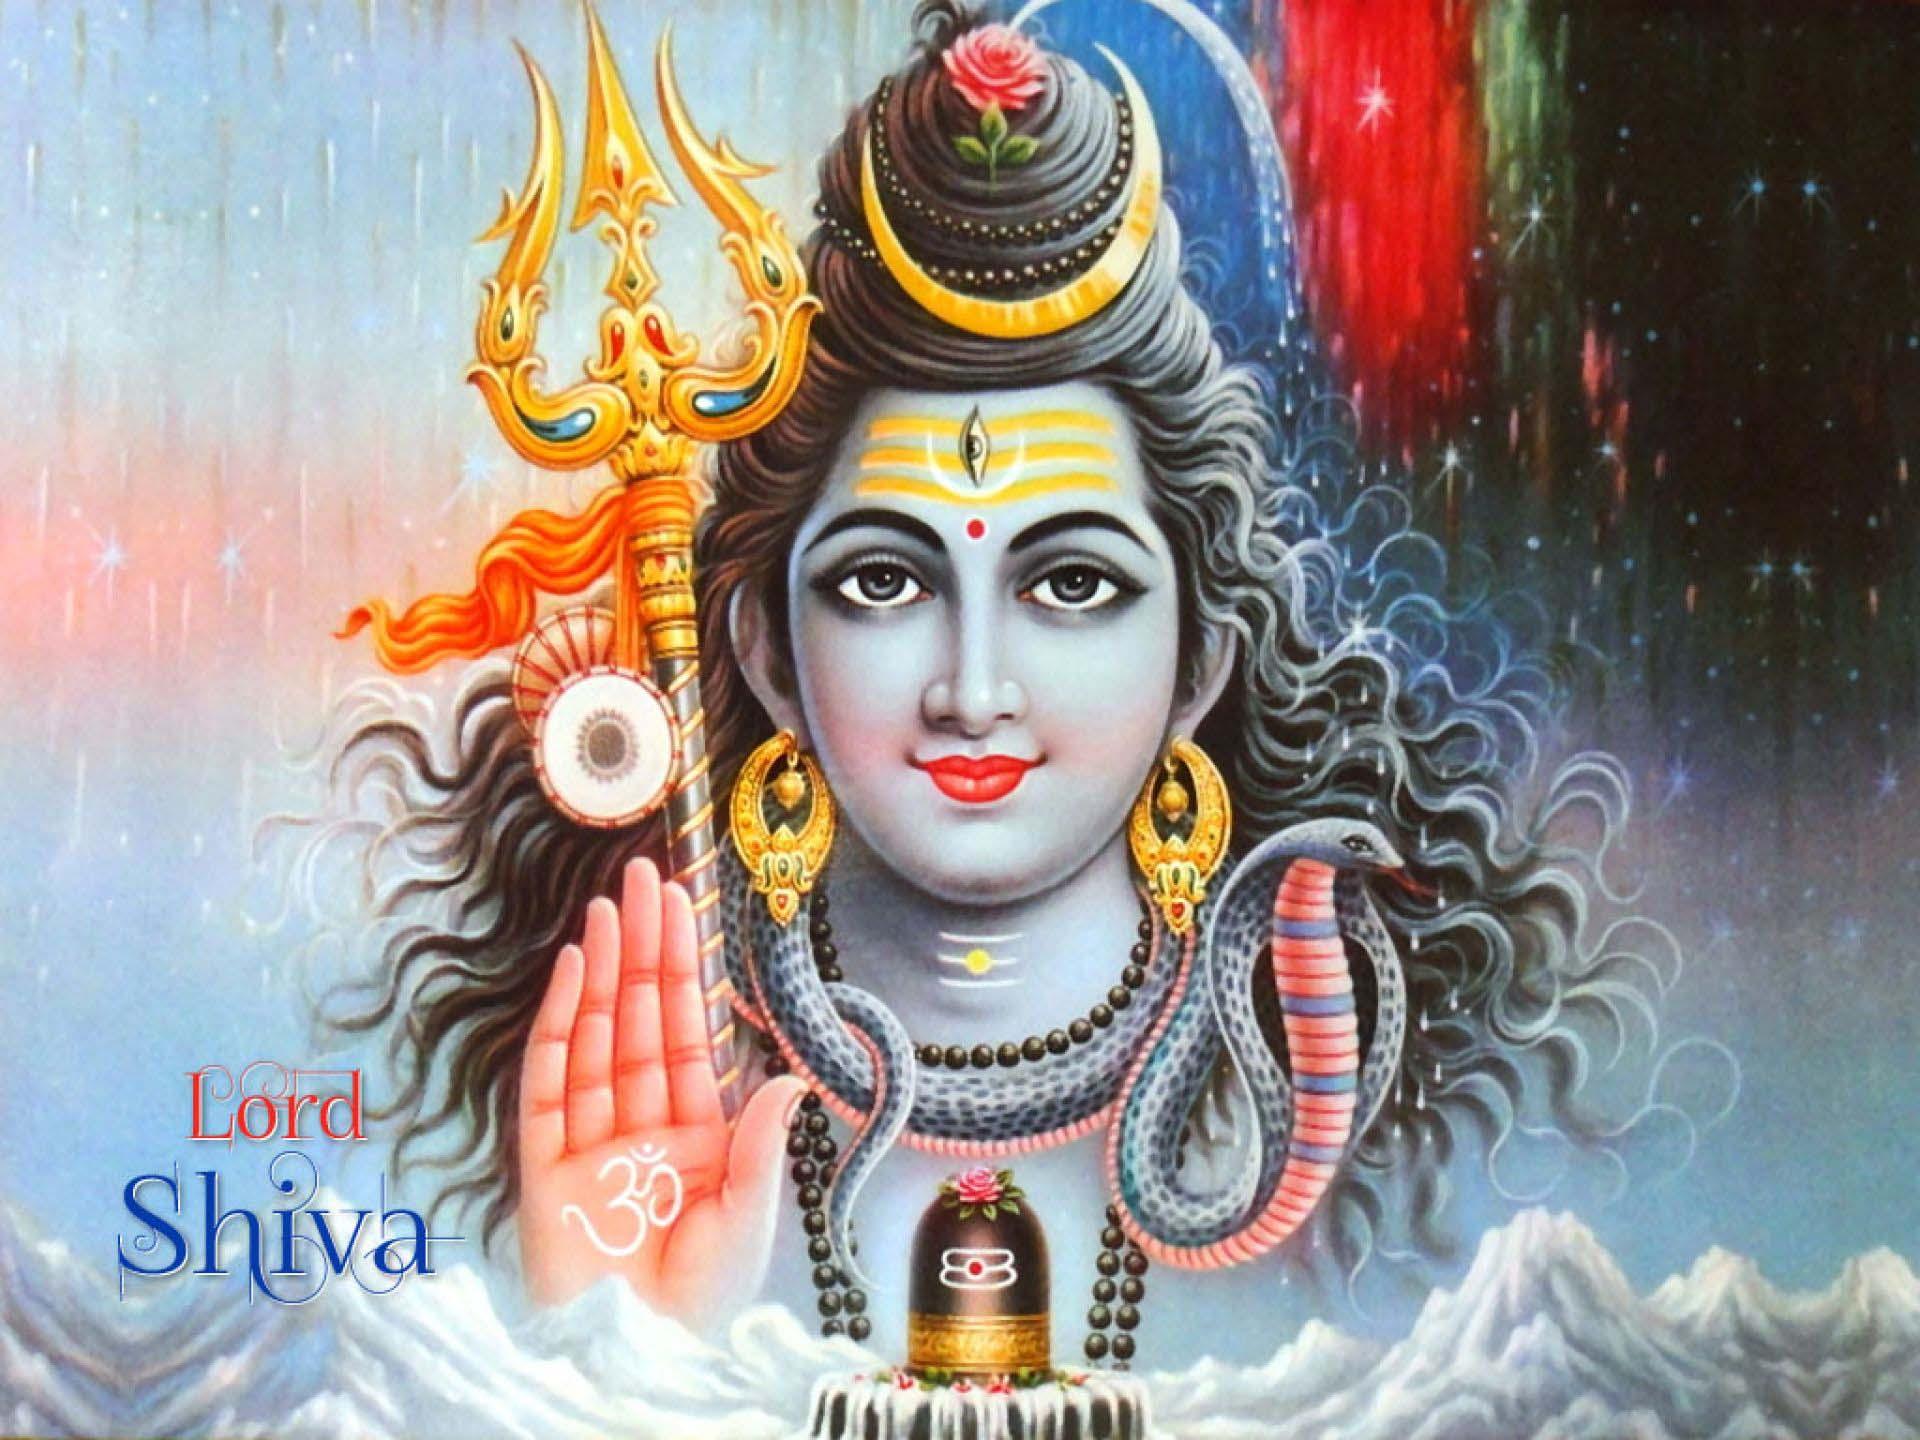 Shiva Wallpaper For Desktop: Lord Shiva Wallpapers High Resolution